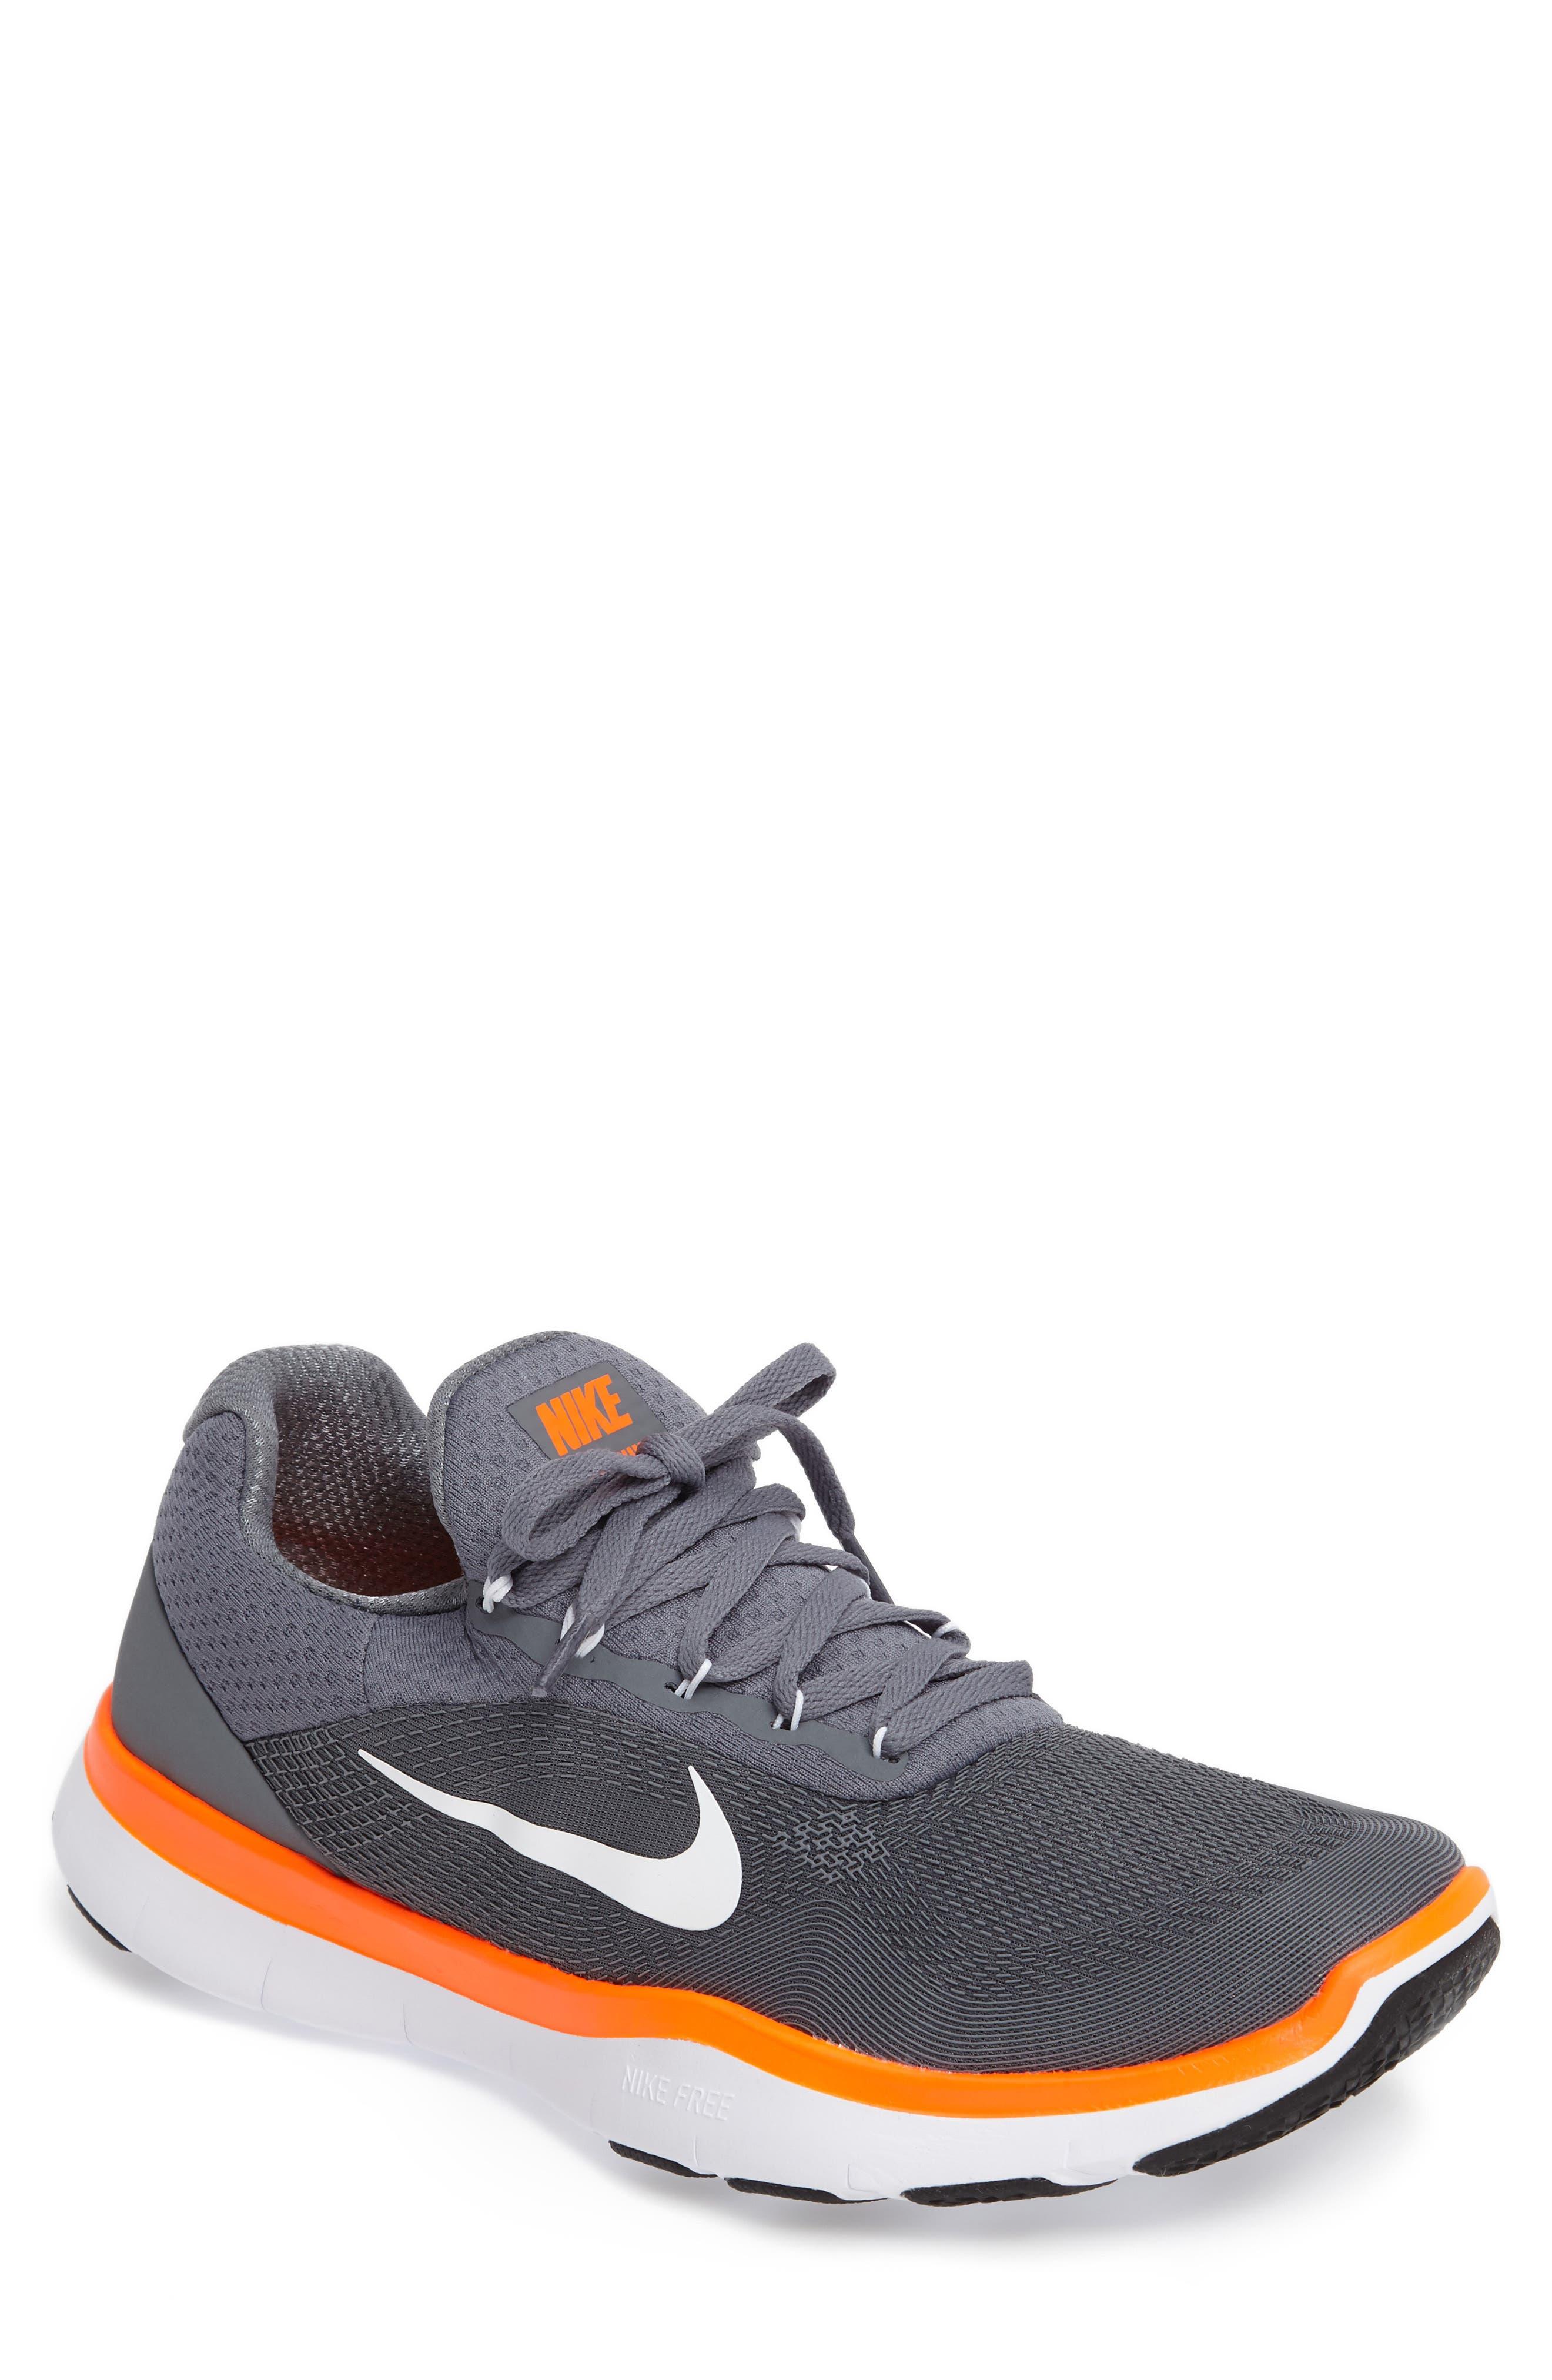 Alternate Image 1 Selected - Nike Free Trainer V7 Training Shoe (Men)